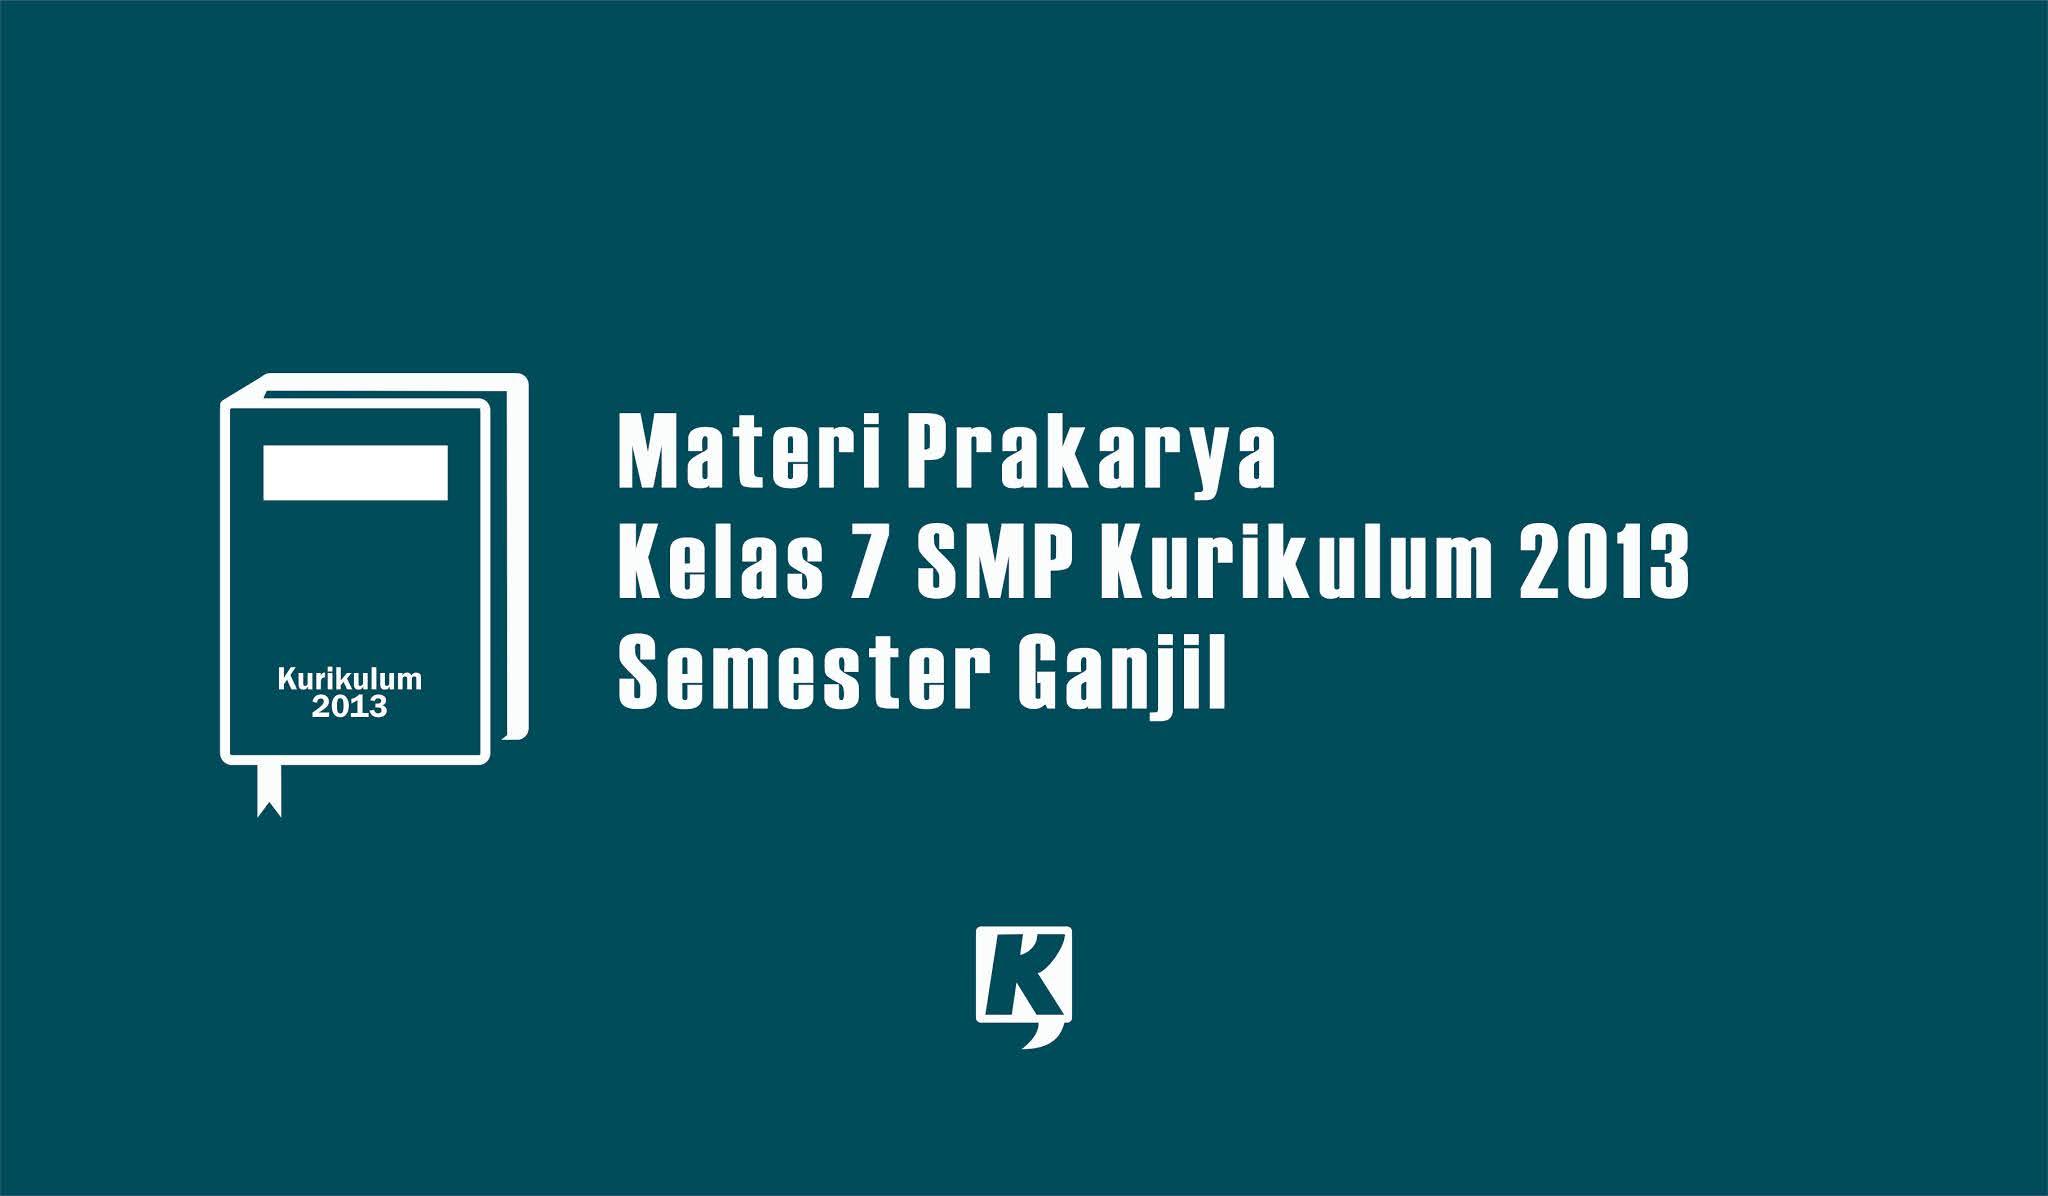 Materi Semester Ganjil: Prakarya Kelas 7 SMP/MTS Kurikulum 2013